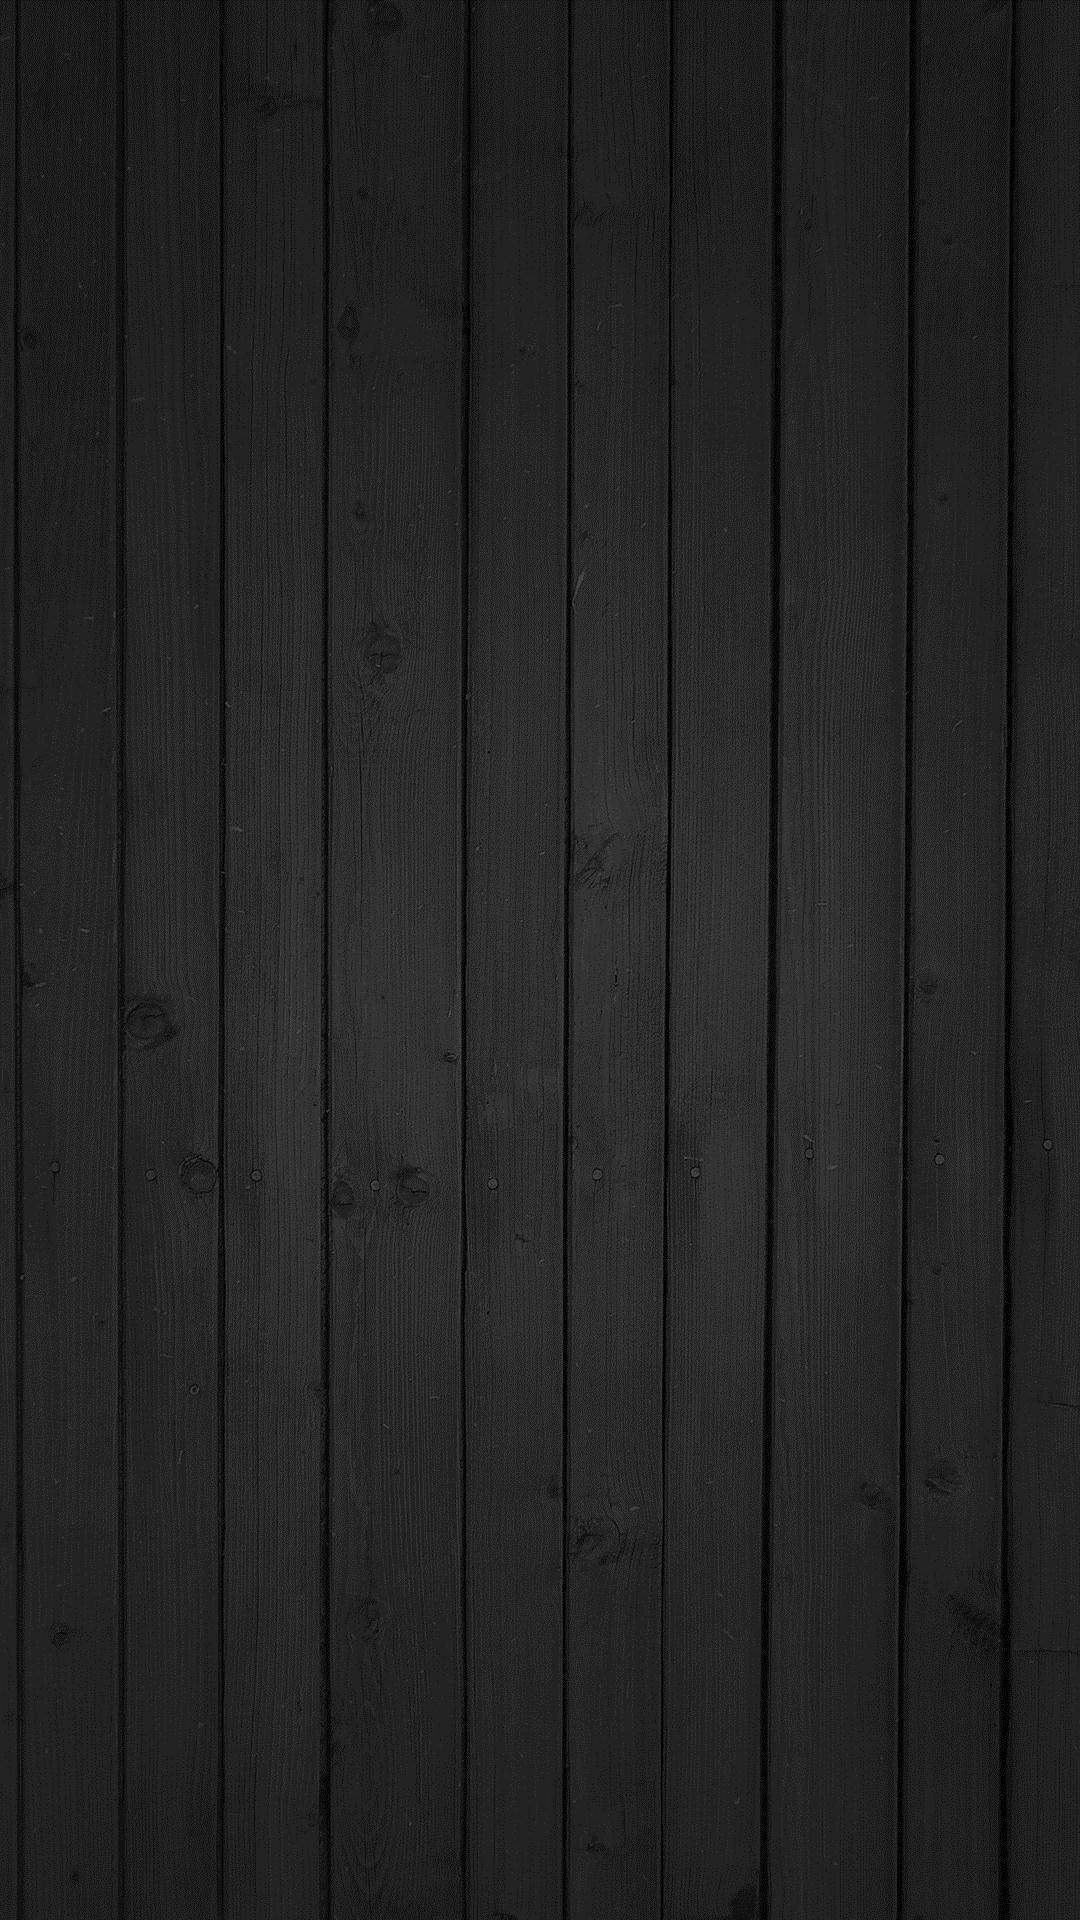 black wood. 1080x1920 Black Wood Texture Android Wallpaper .